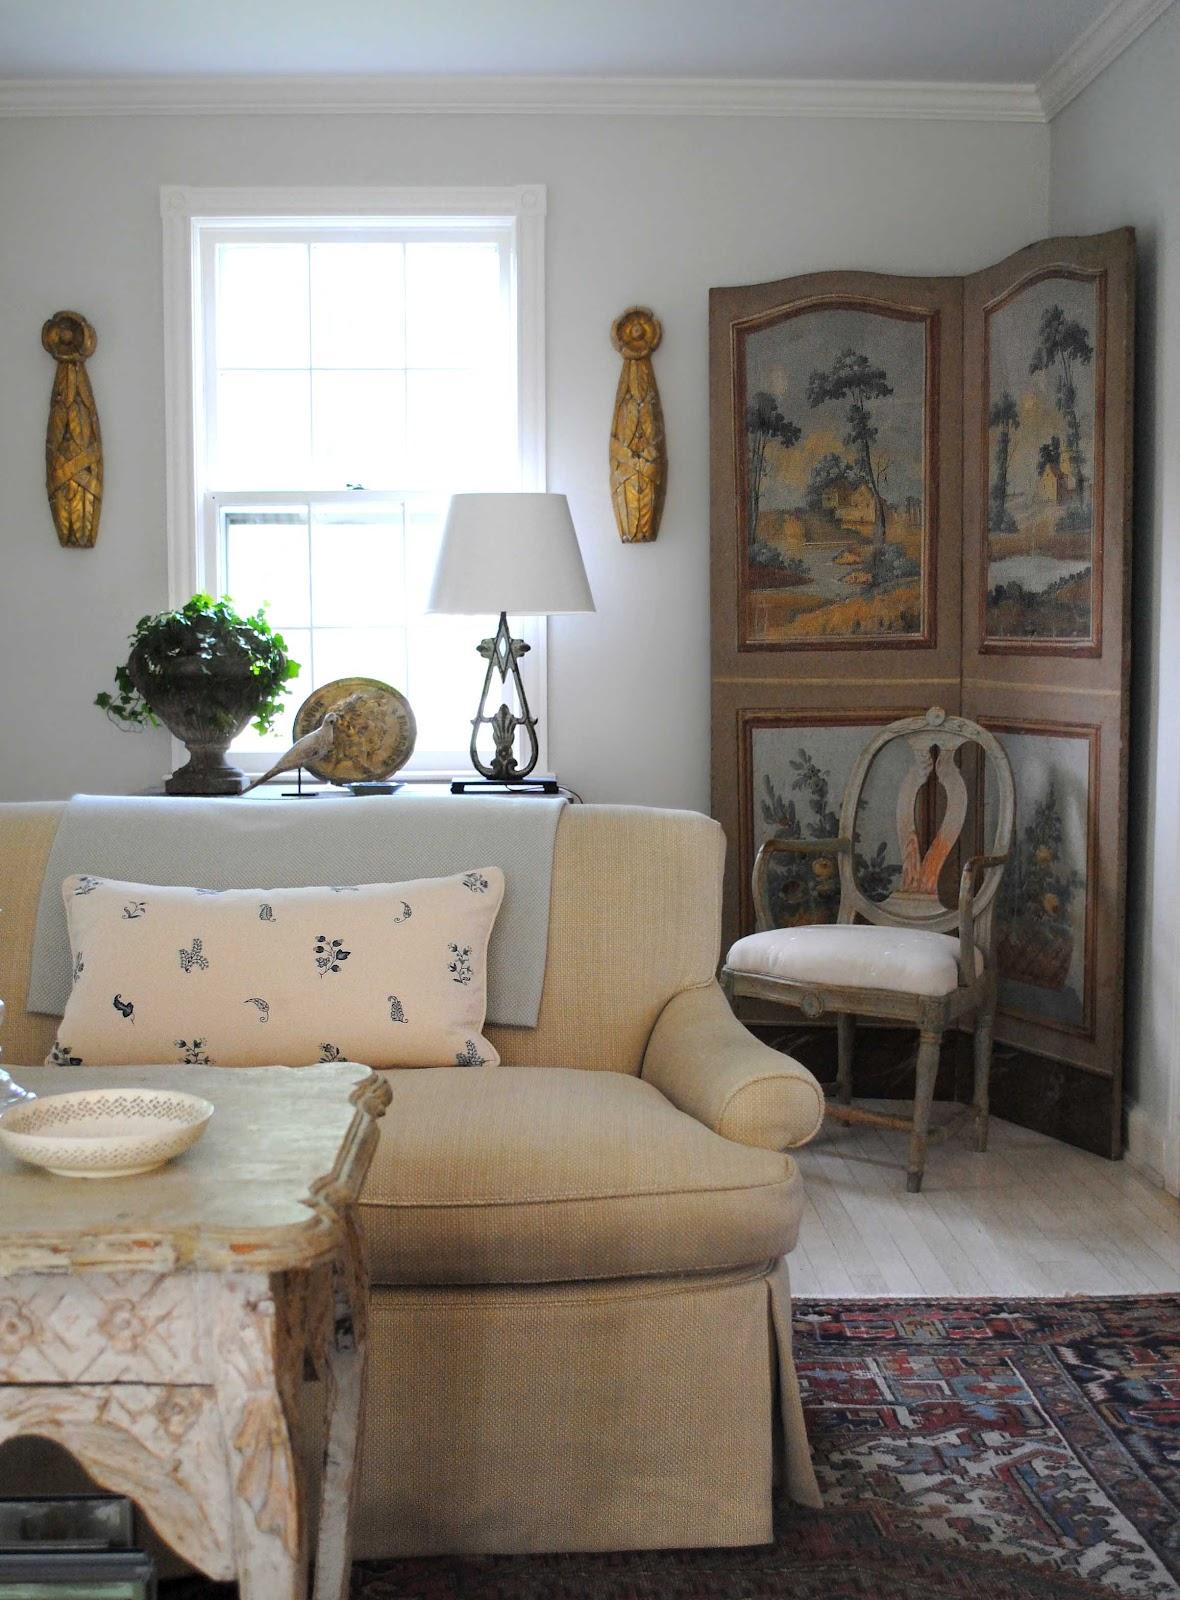 Interior & Garden Design: A Swedish Style